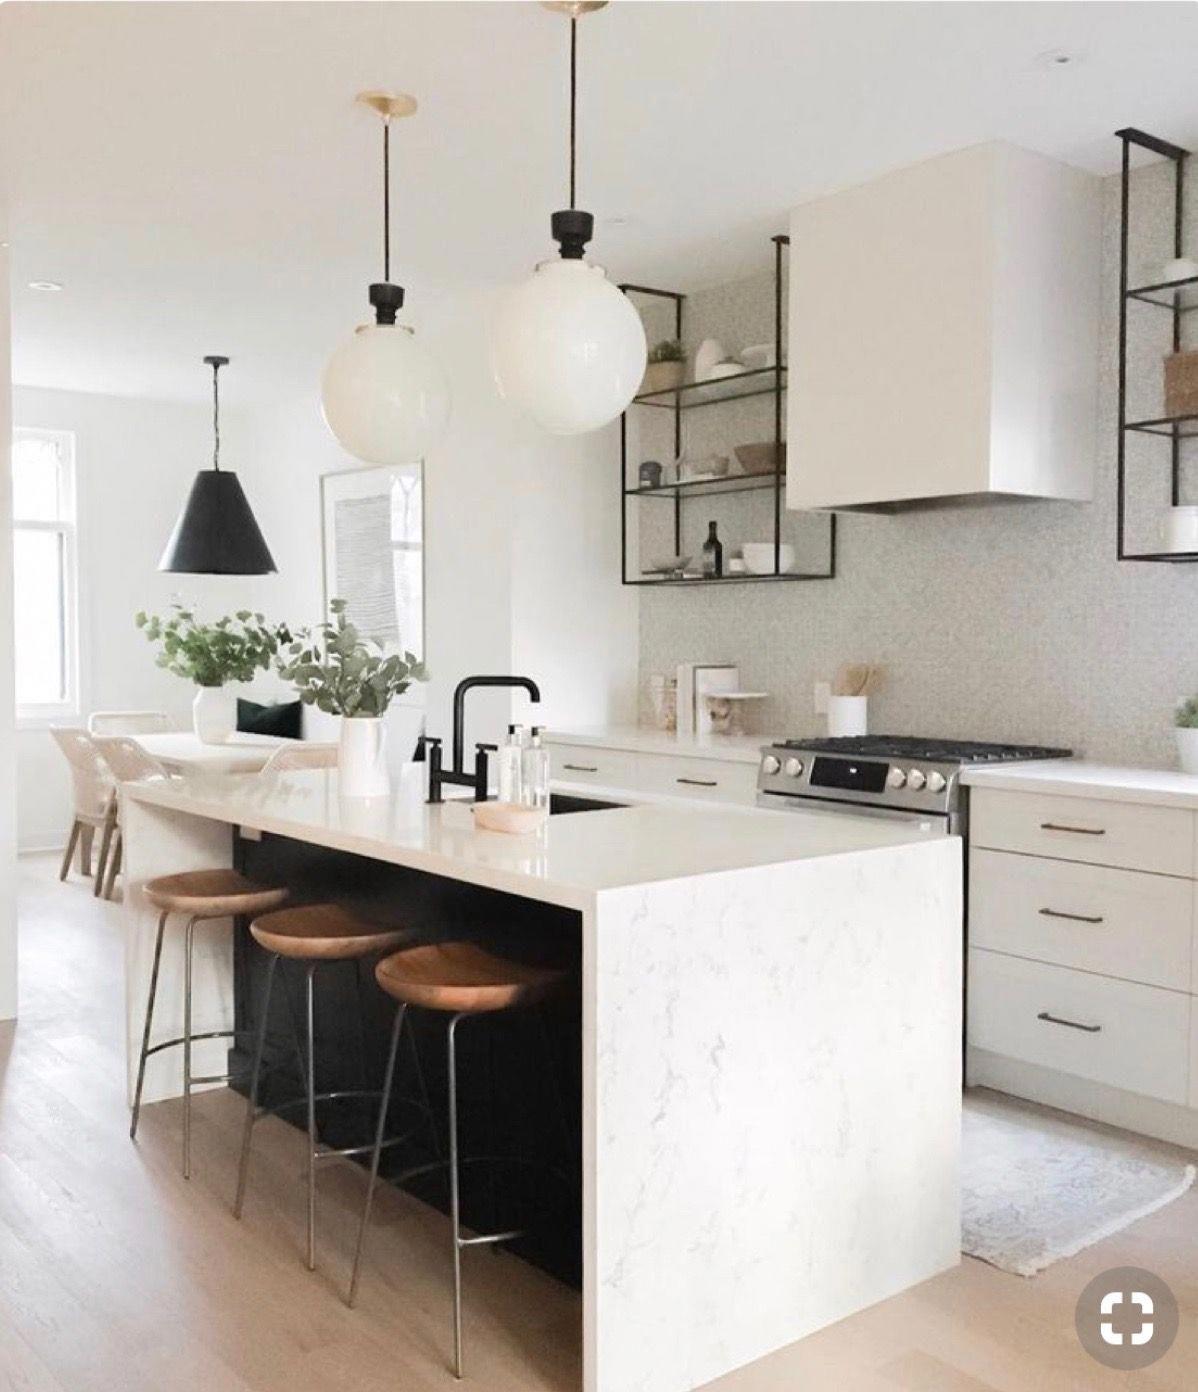 homeremodelloan home improvement loan in 2018 pinterest modern rh pinterest com